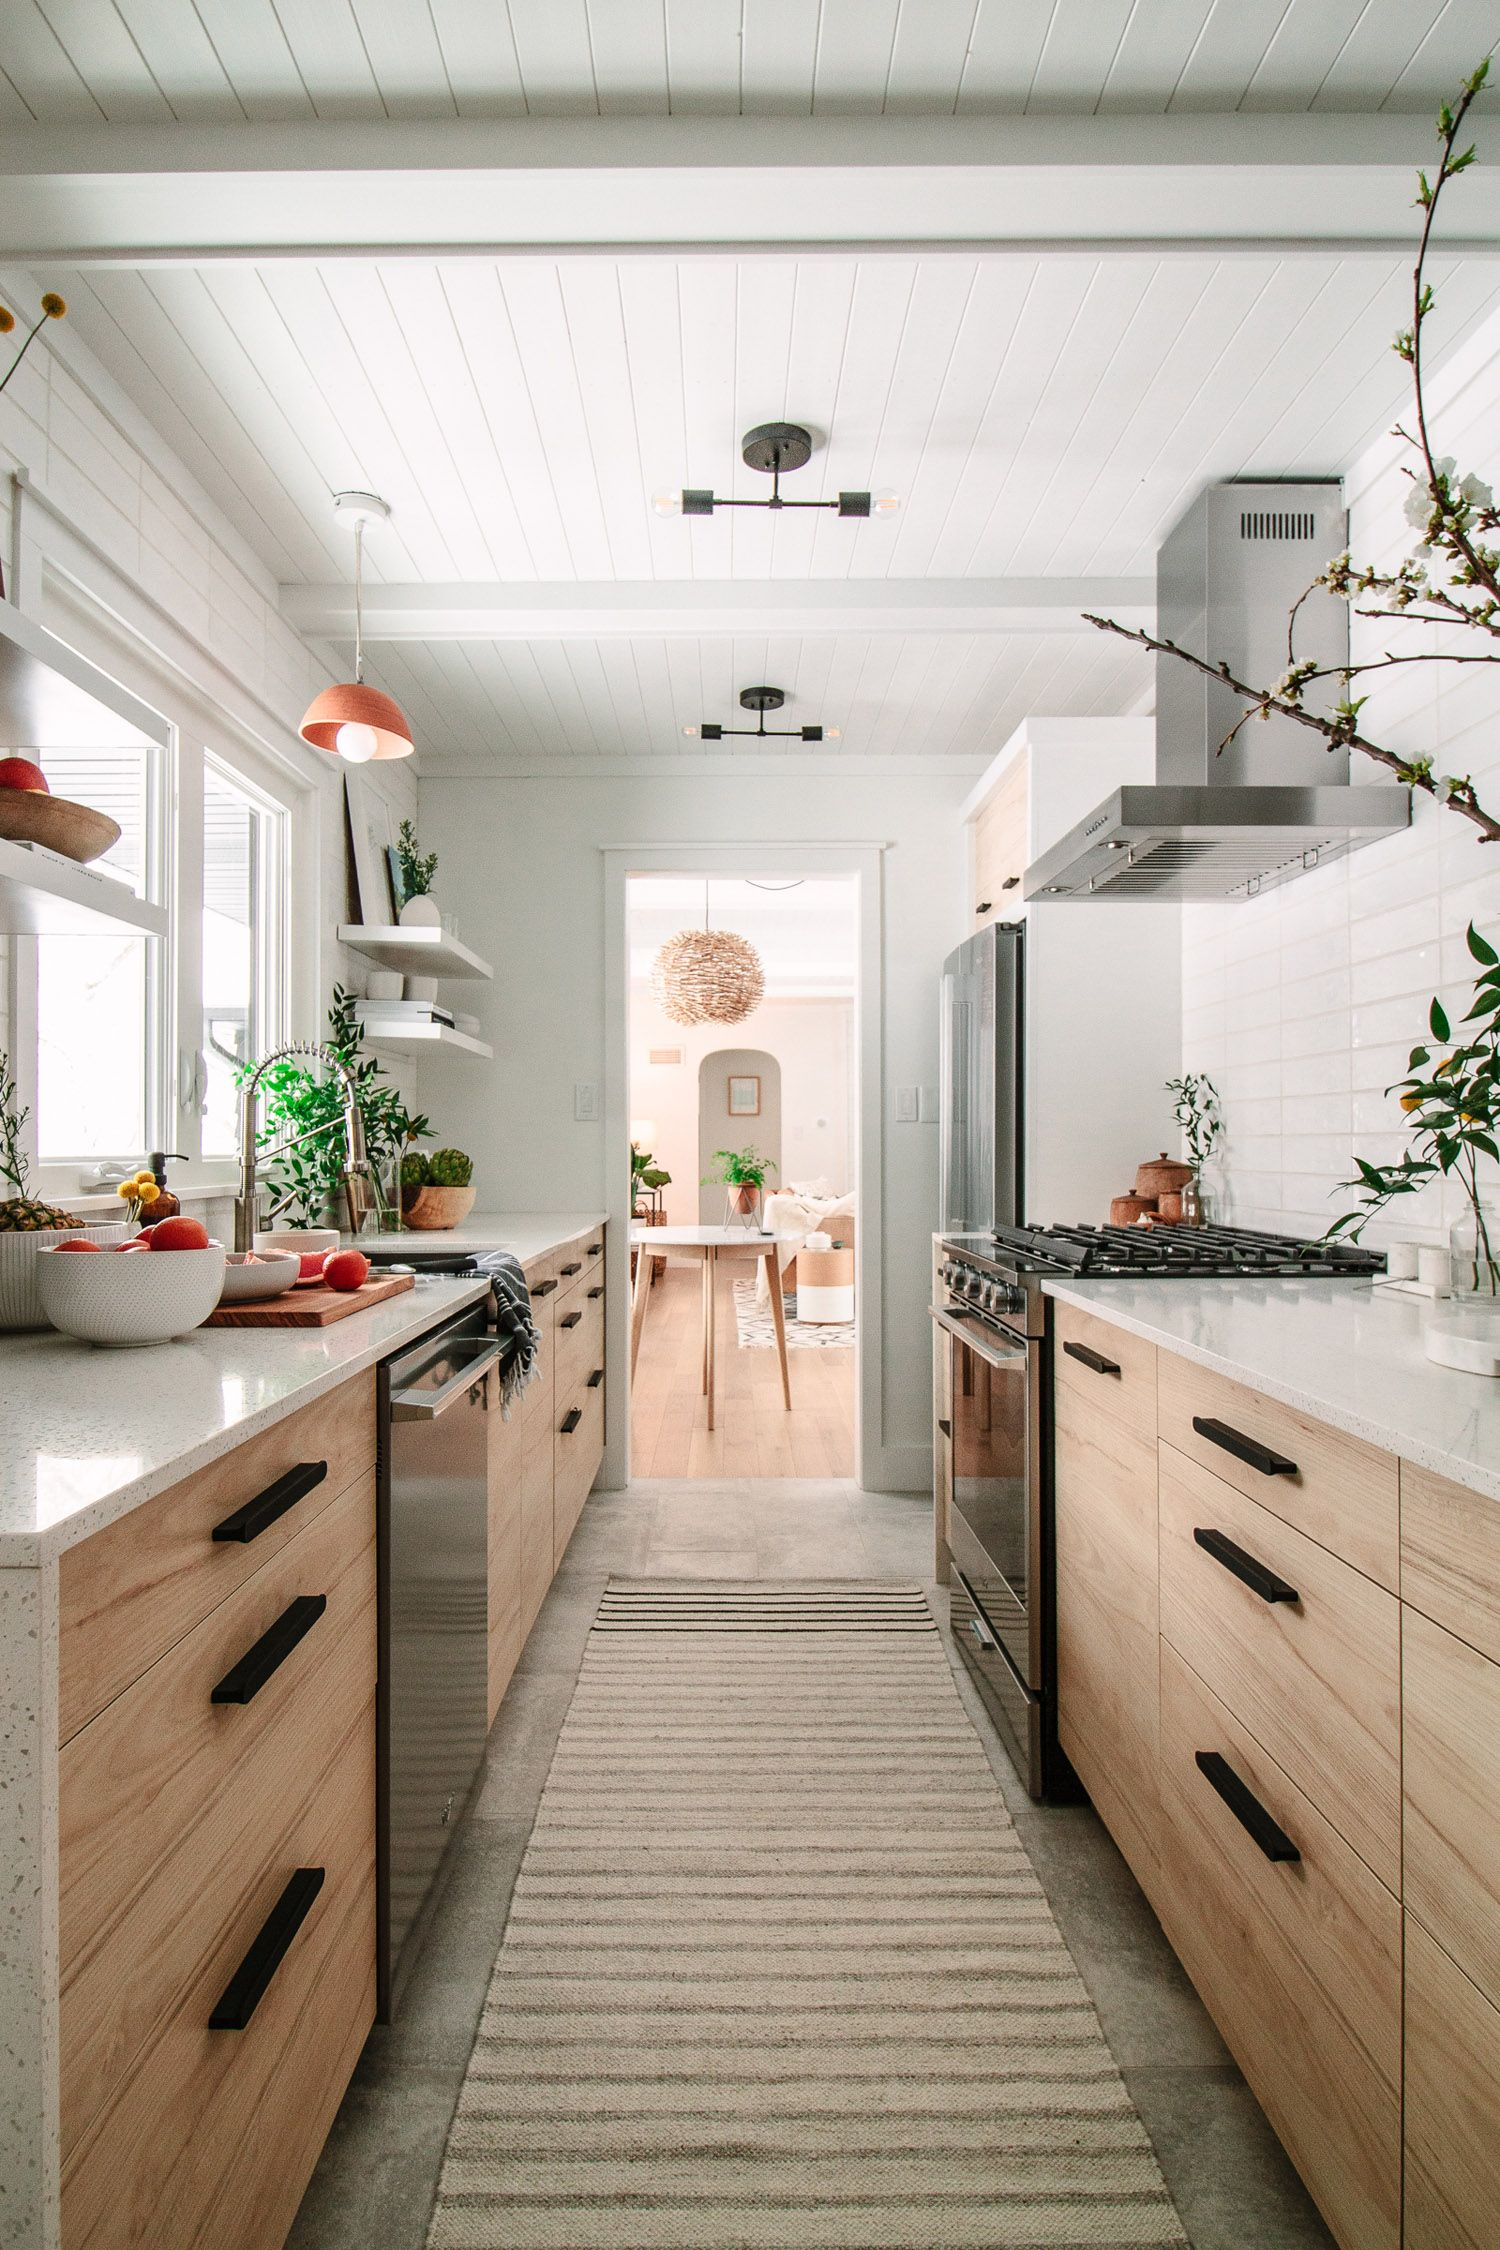 12 Best Galley Kitchen Design Ideas - Remodel Tips for Galley Kitchens